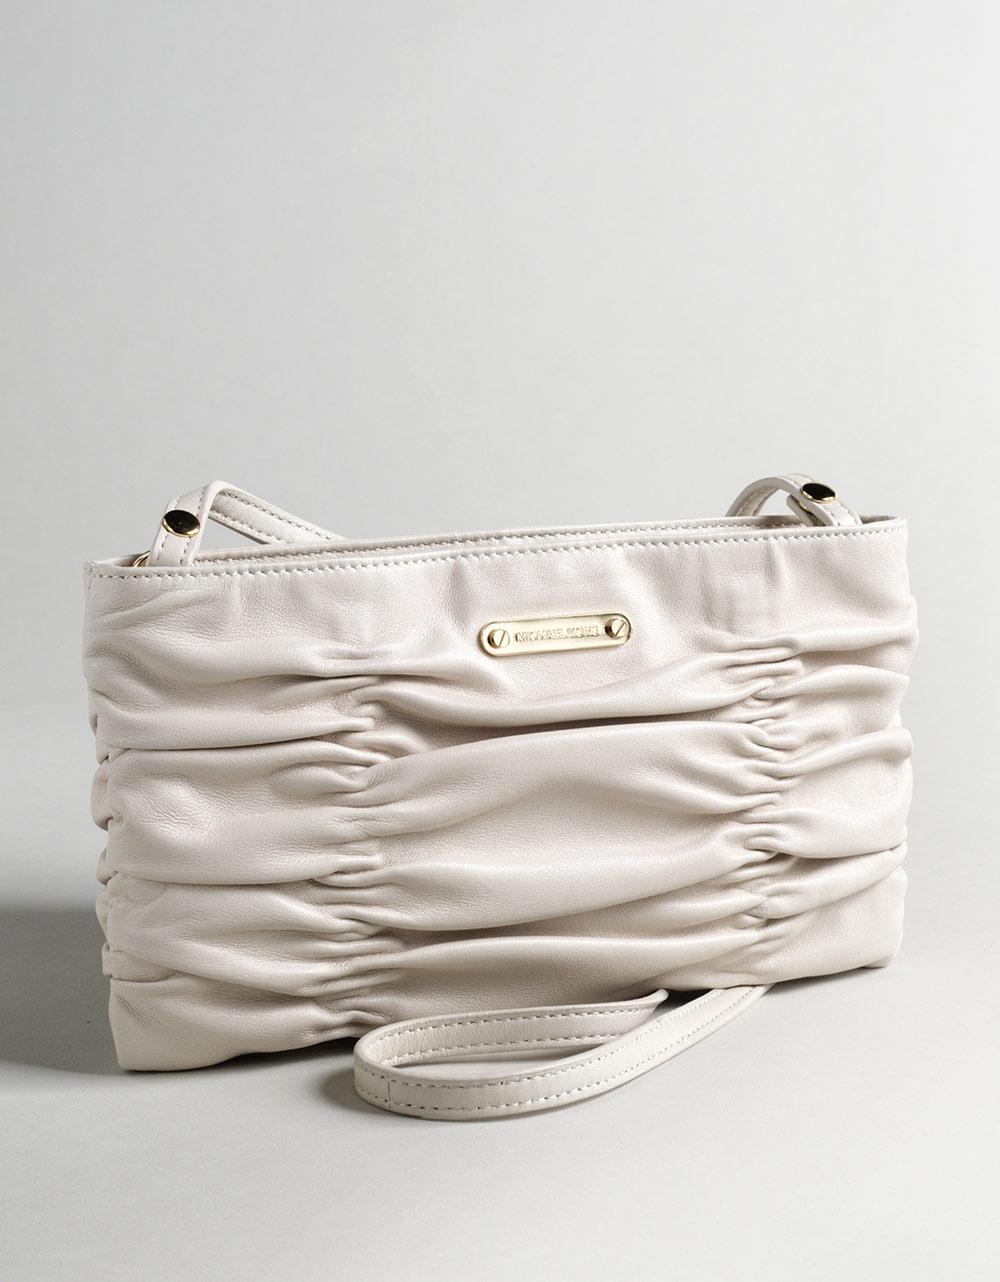 d123414b38e6 Lyst - MICHAEL Michael Kors Webster Wallet Clutch Purse in White